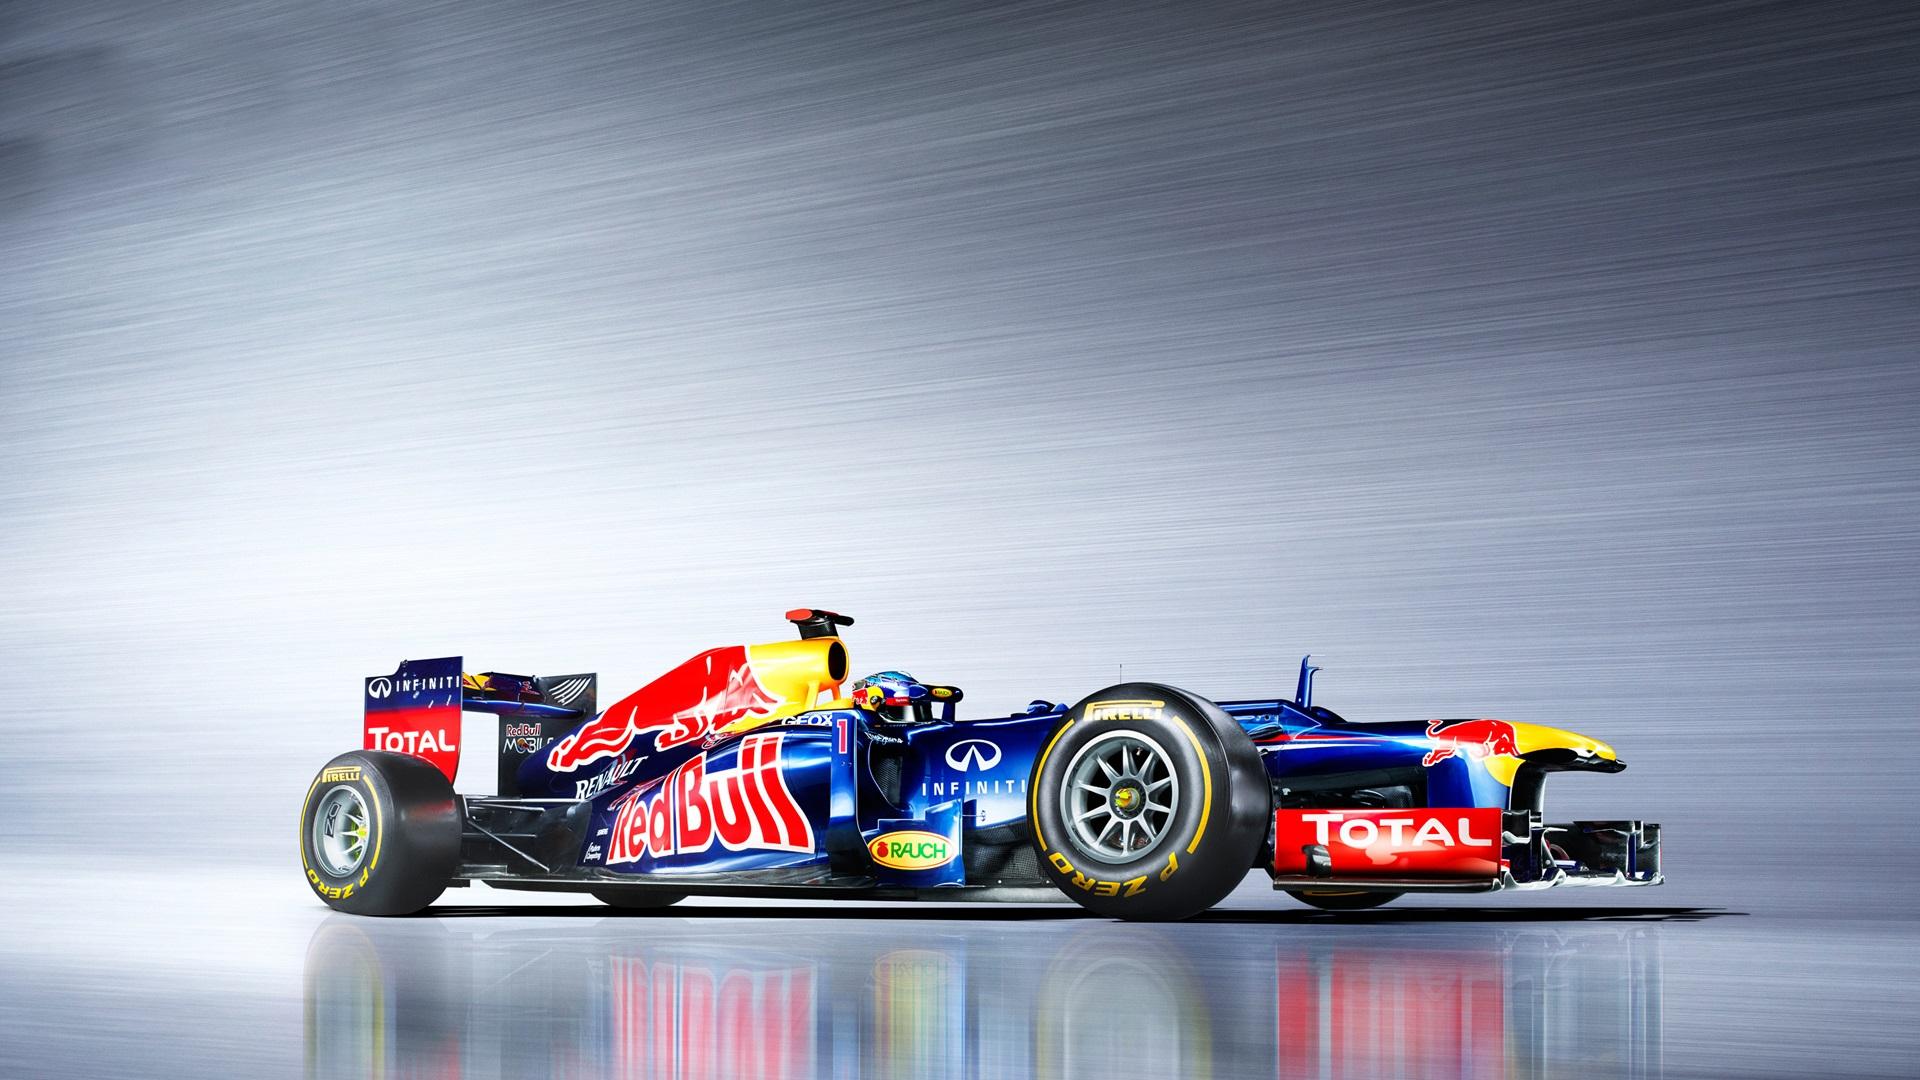 Wallpaper Formula 1 F1 Red Bull Supercar 1920x1200 Hd